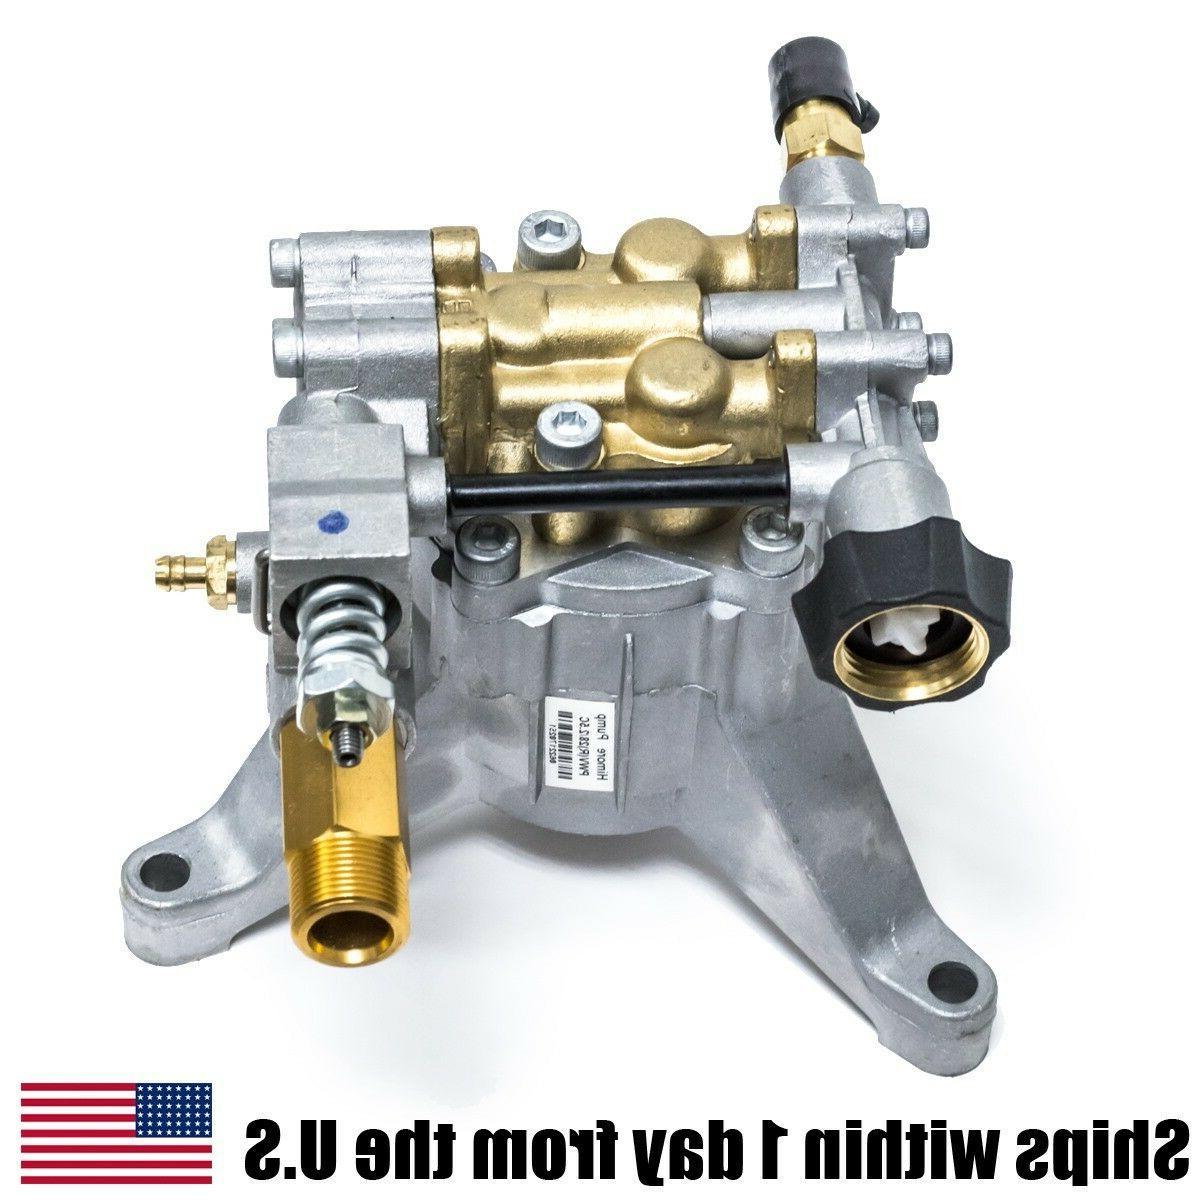 3100 PSI Pressure Washer Pump Simpson